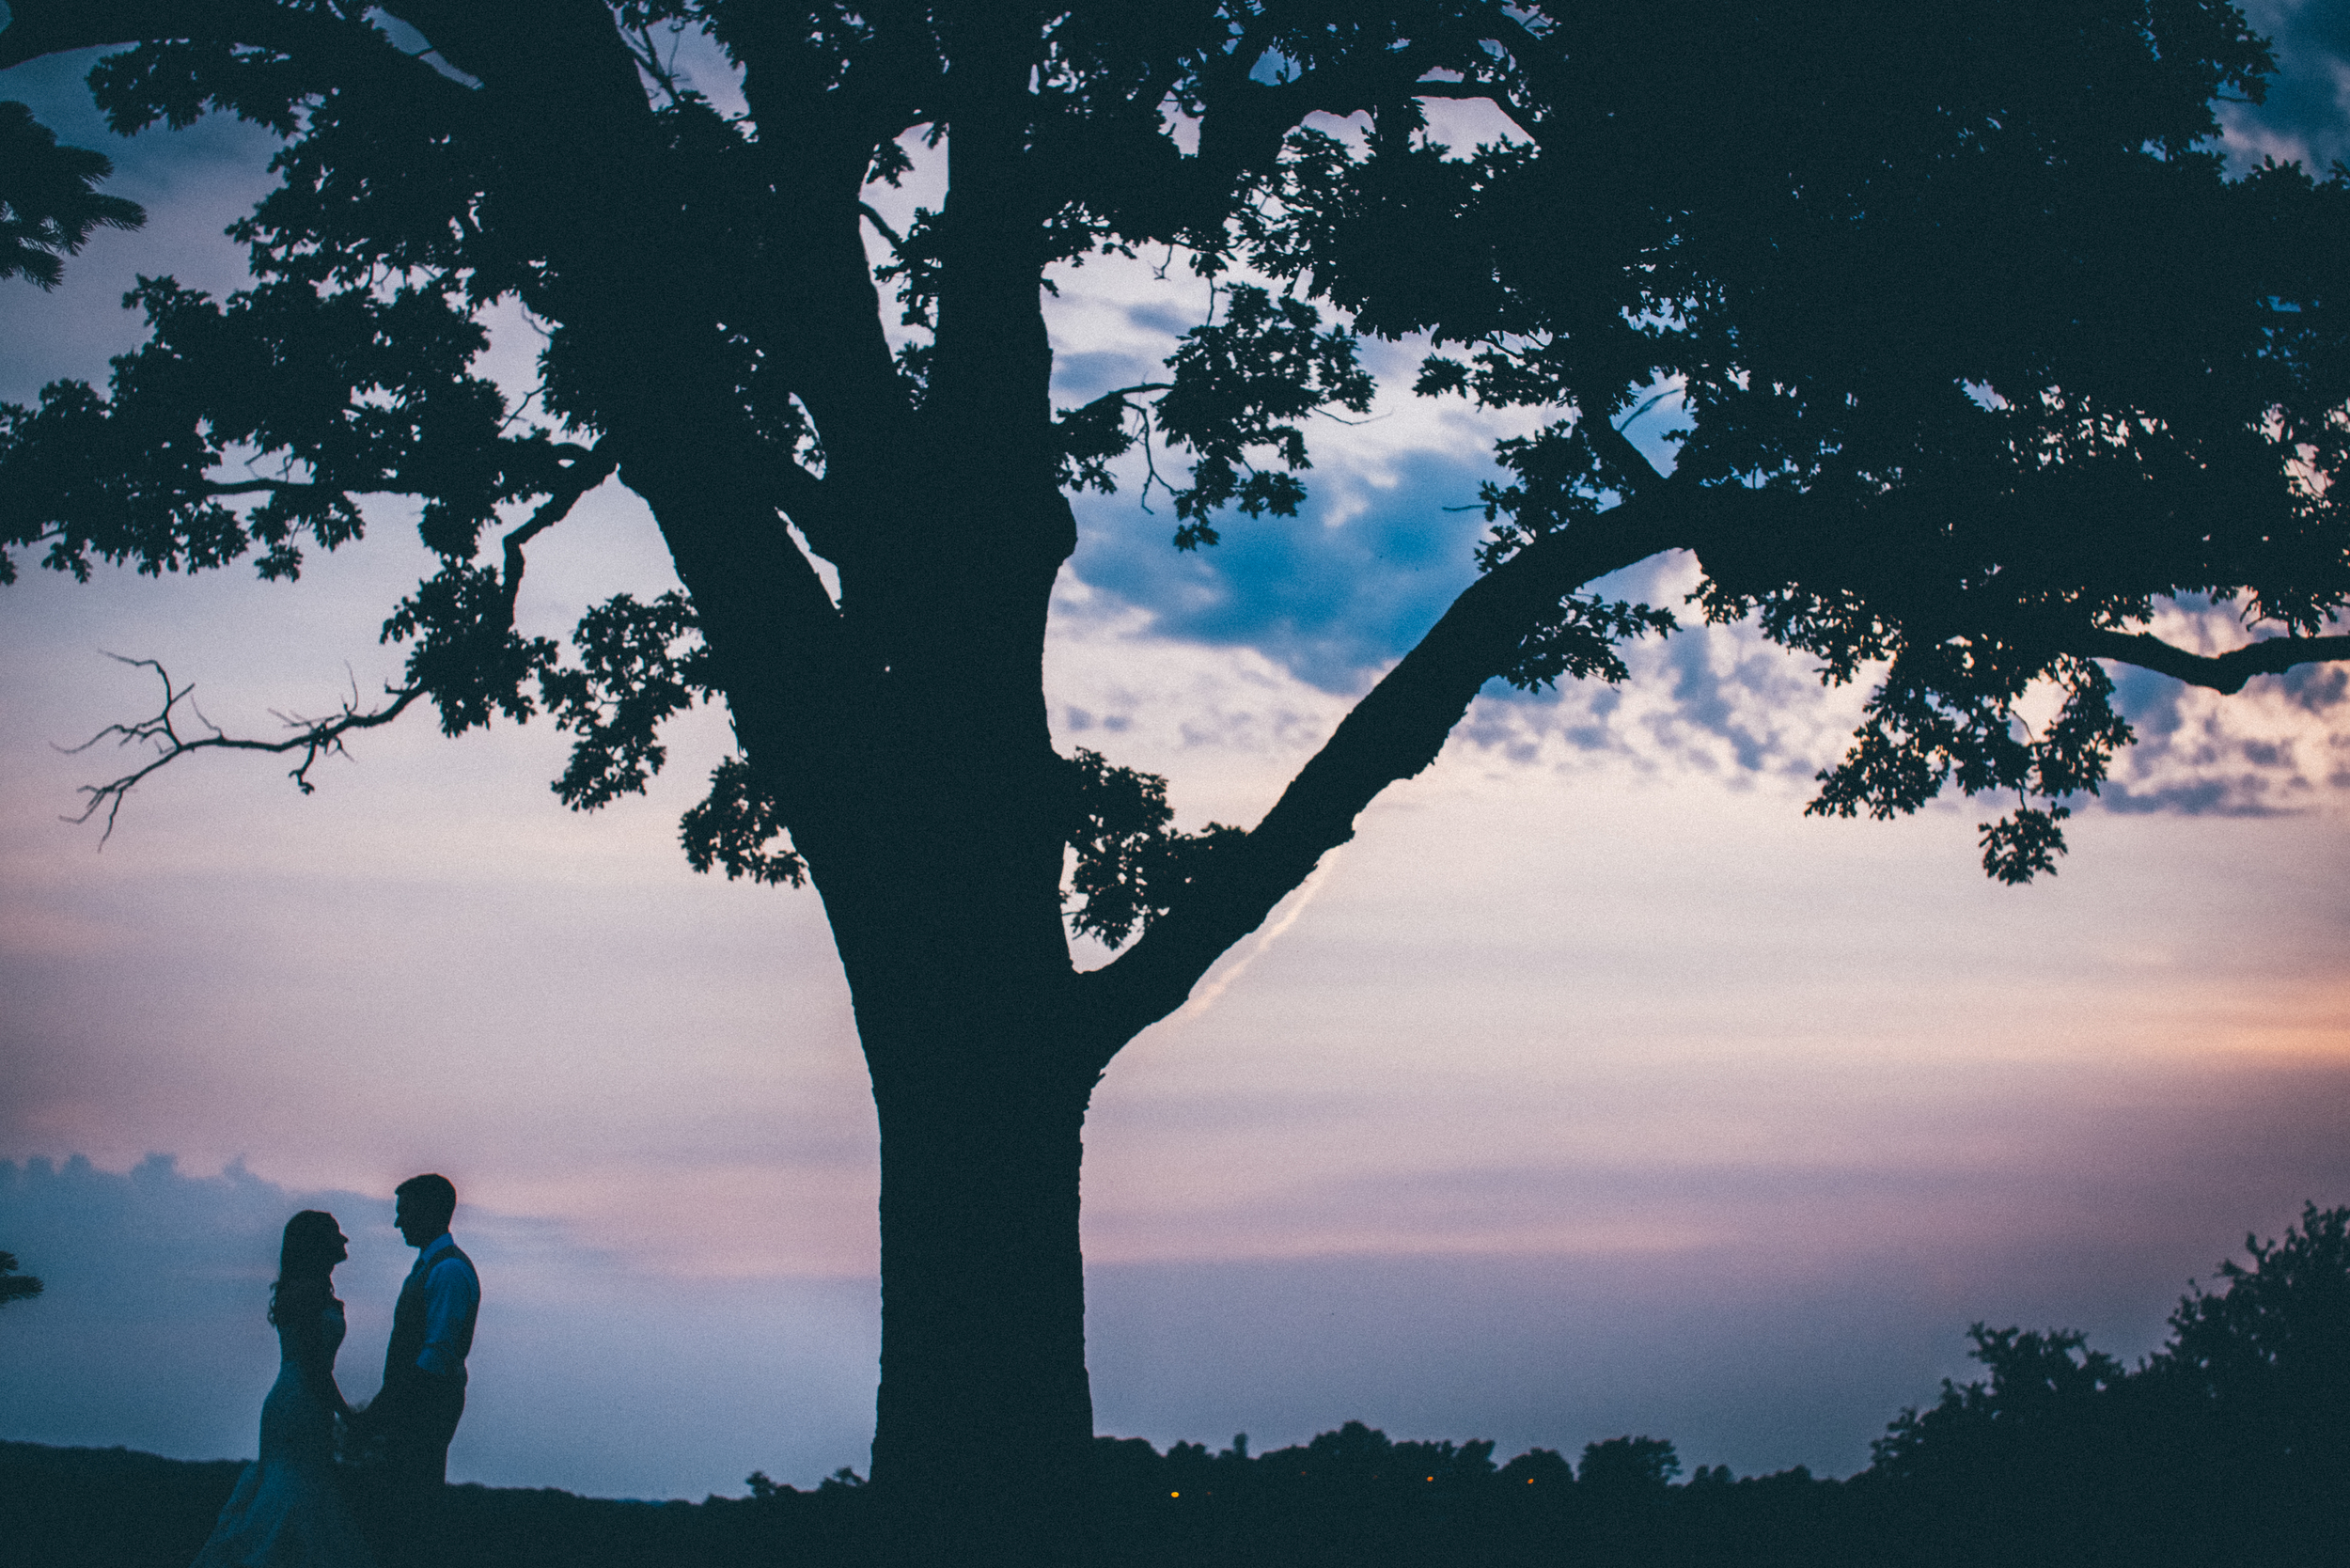 Grand-Rapids-Michigan-Wedding-Photography-Cinematography-Shadow-Shine-Pictures-Josh-Cassie-Teigen-Schoonmaker-011